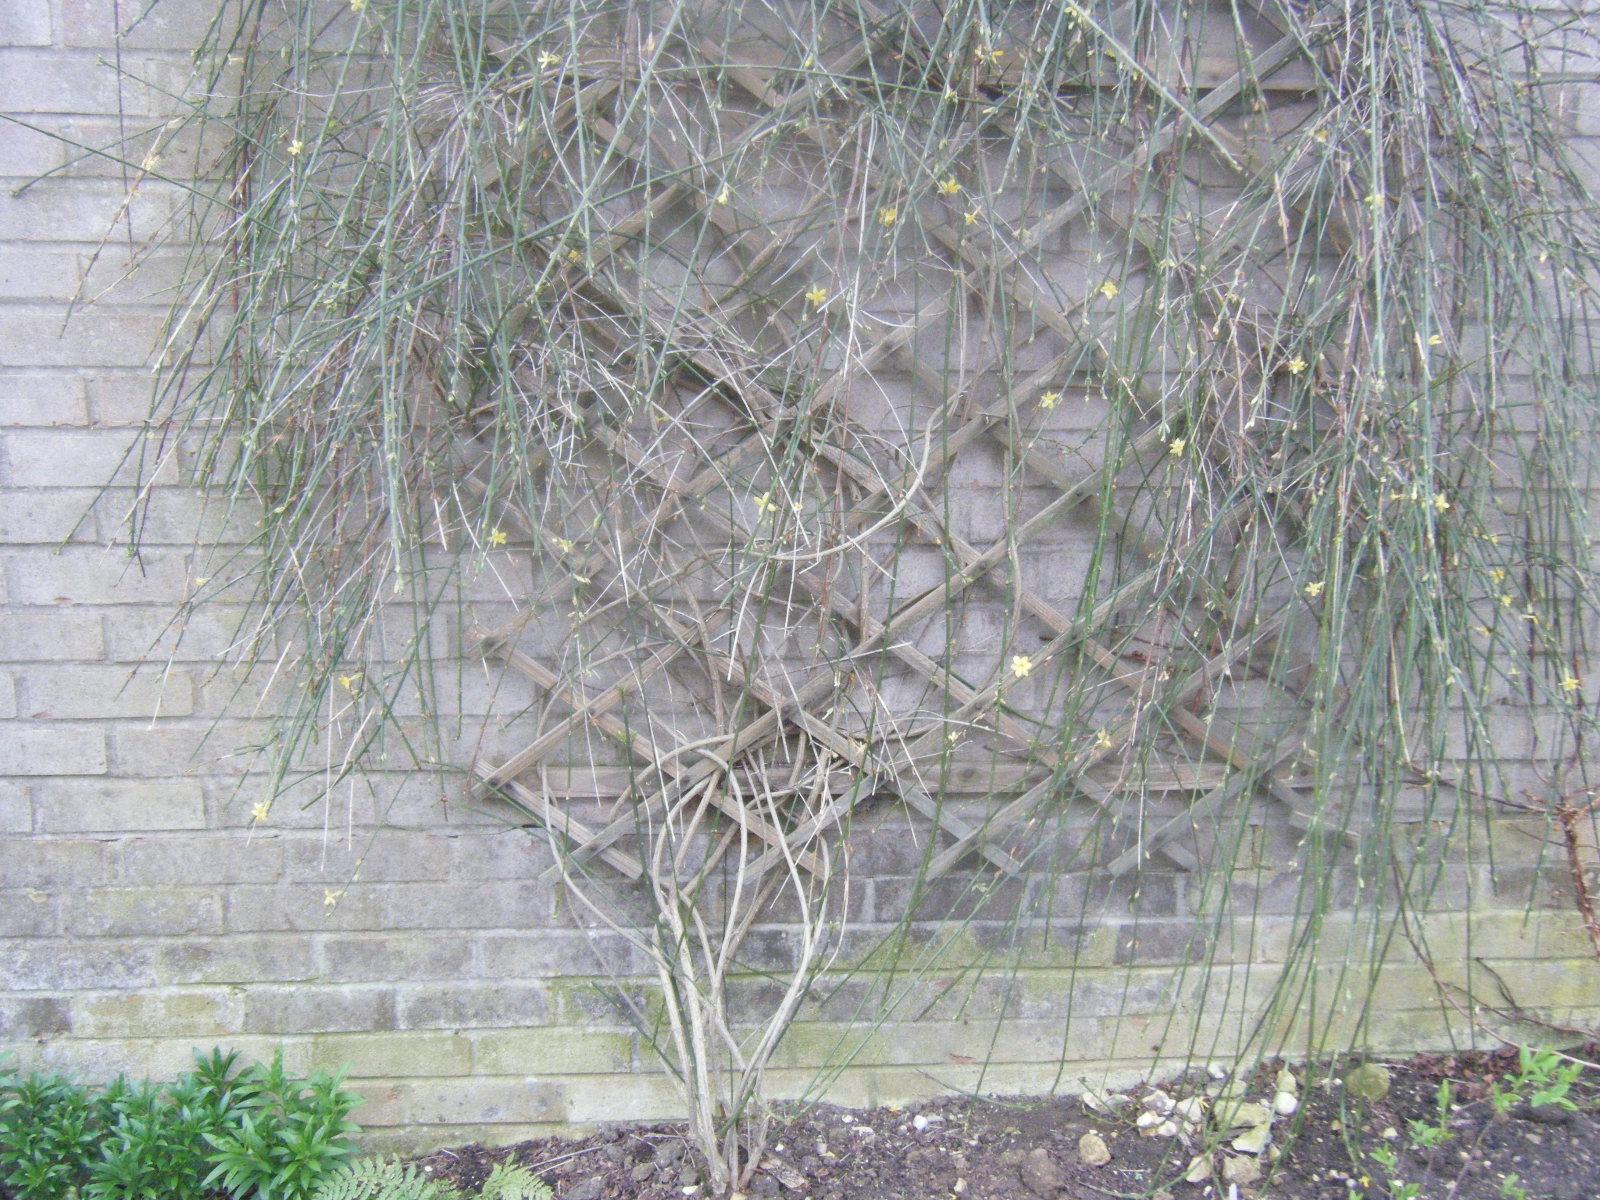 Pruning jasmine forum gardenersworld bob image image izmirmasajfo